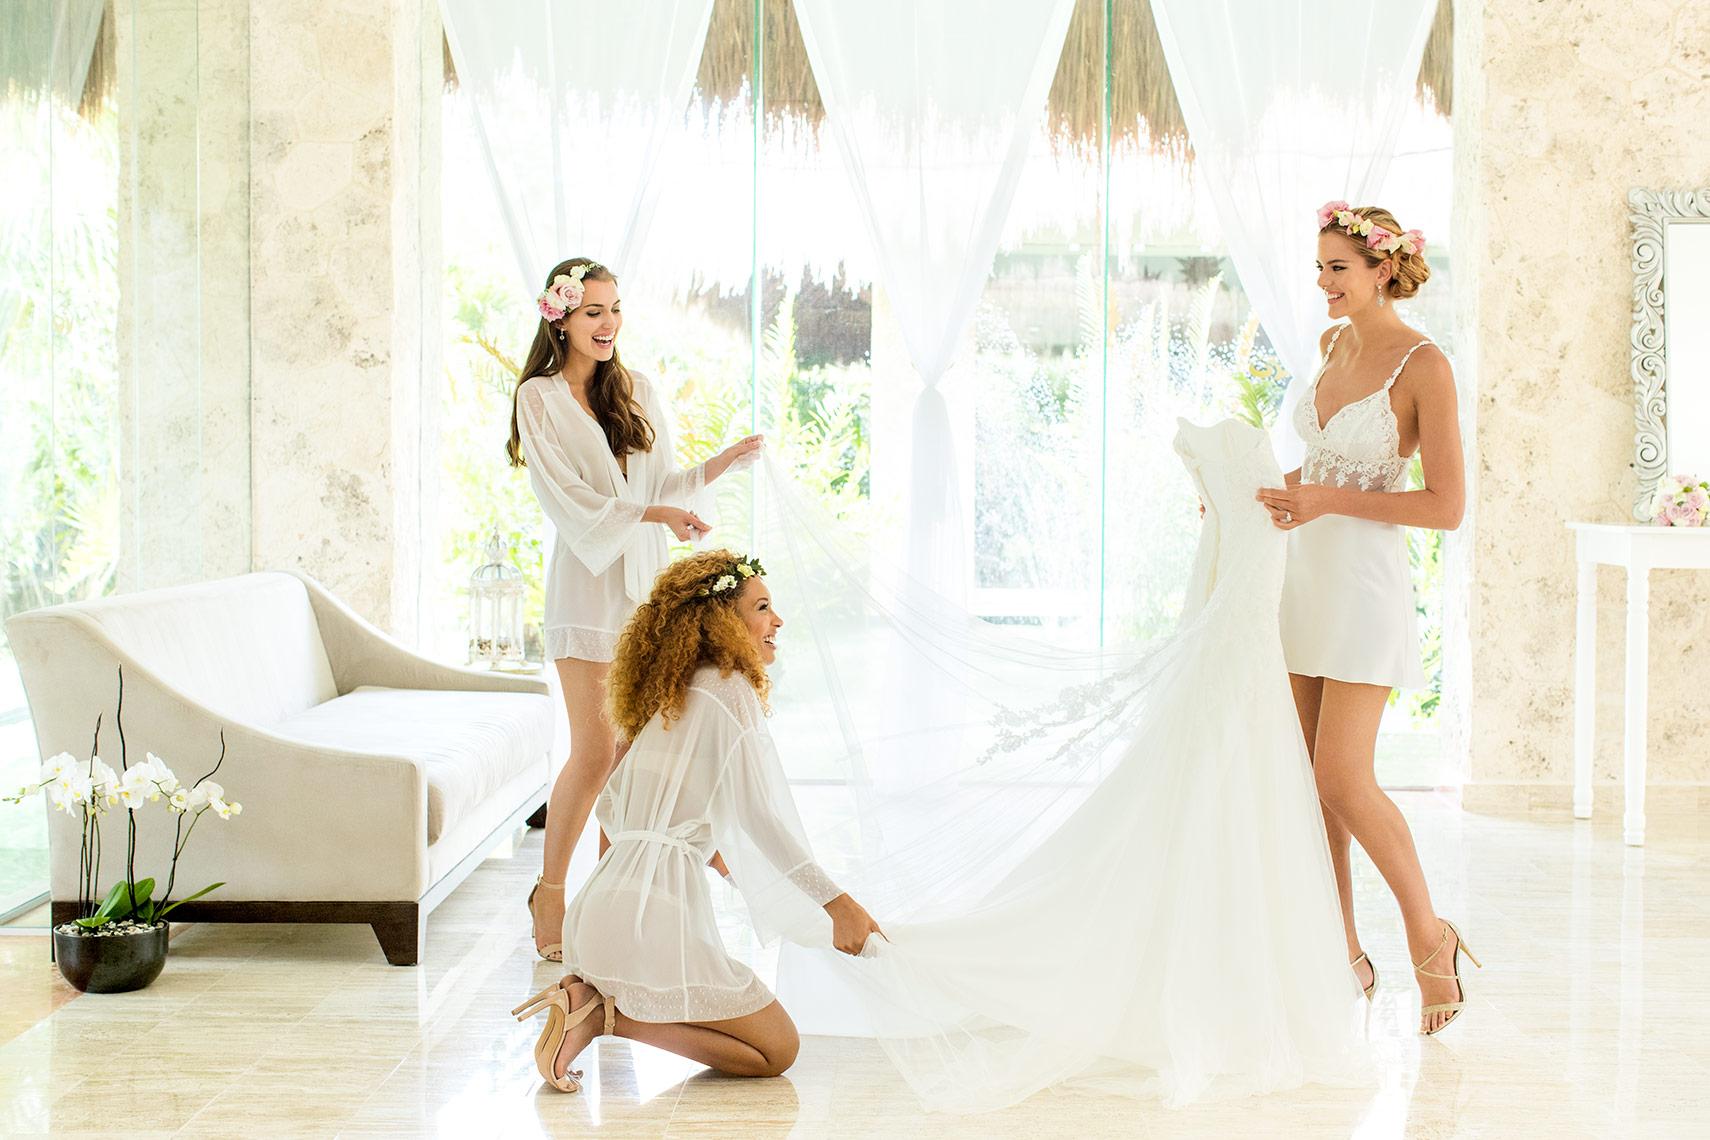 Wedding-GettingReady-PaladiumMX-4332-1COLORFLATWEB.jpg